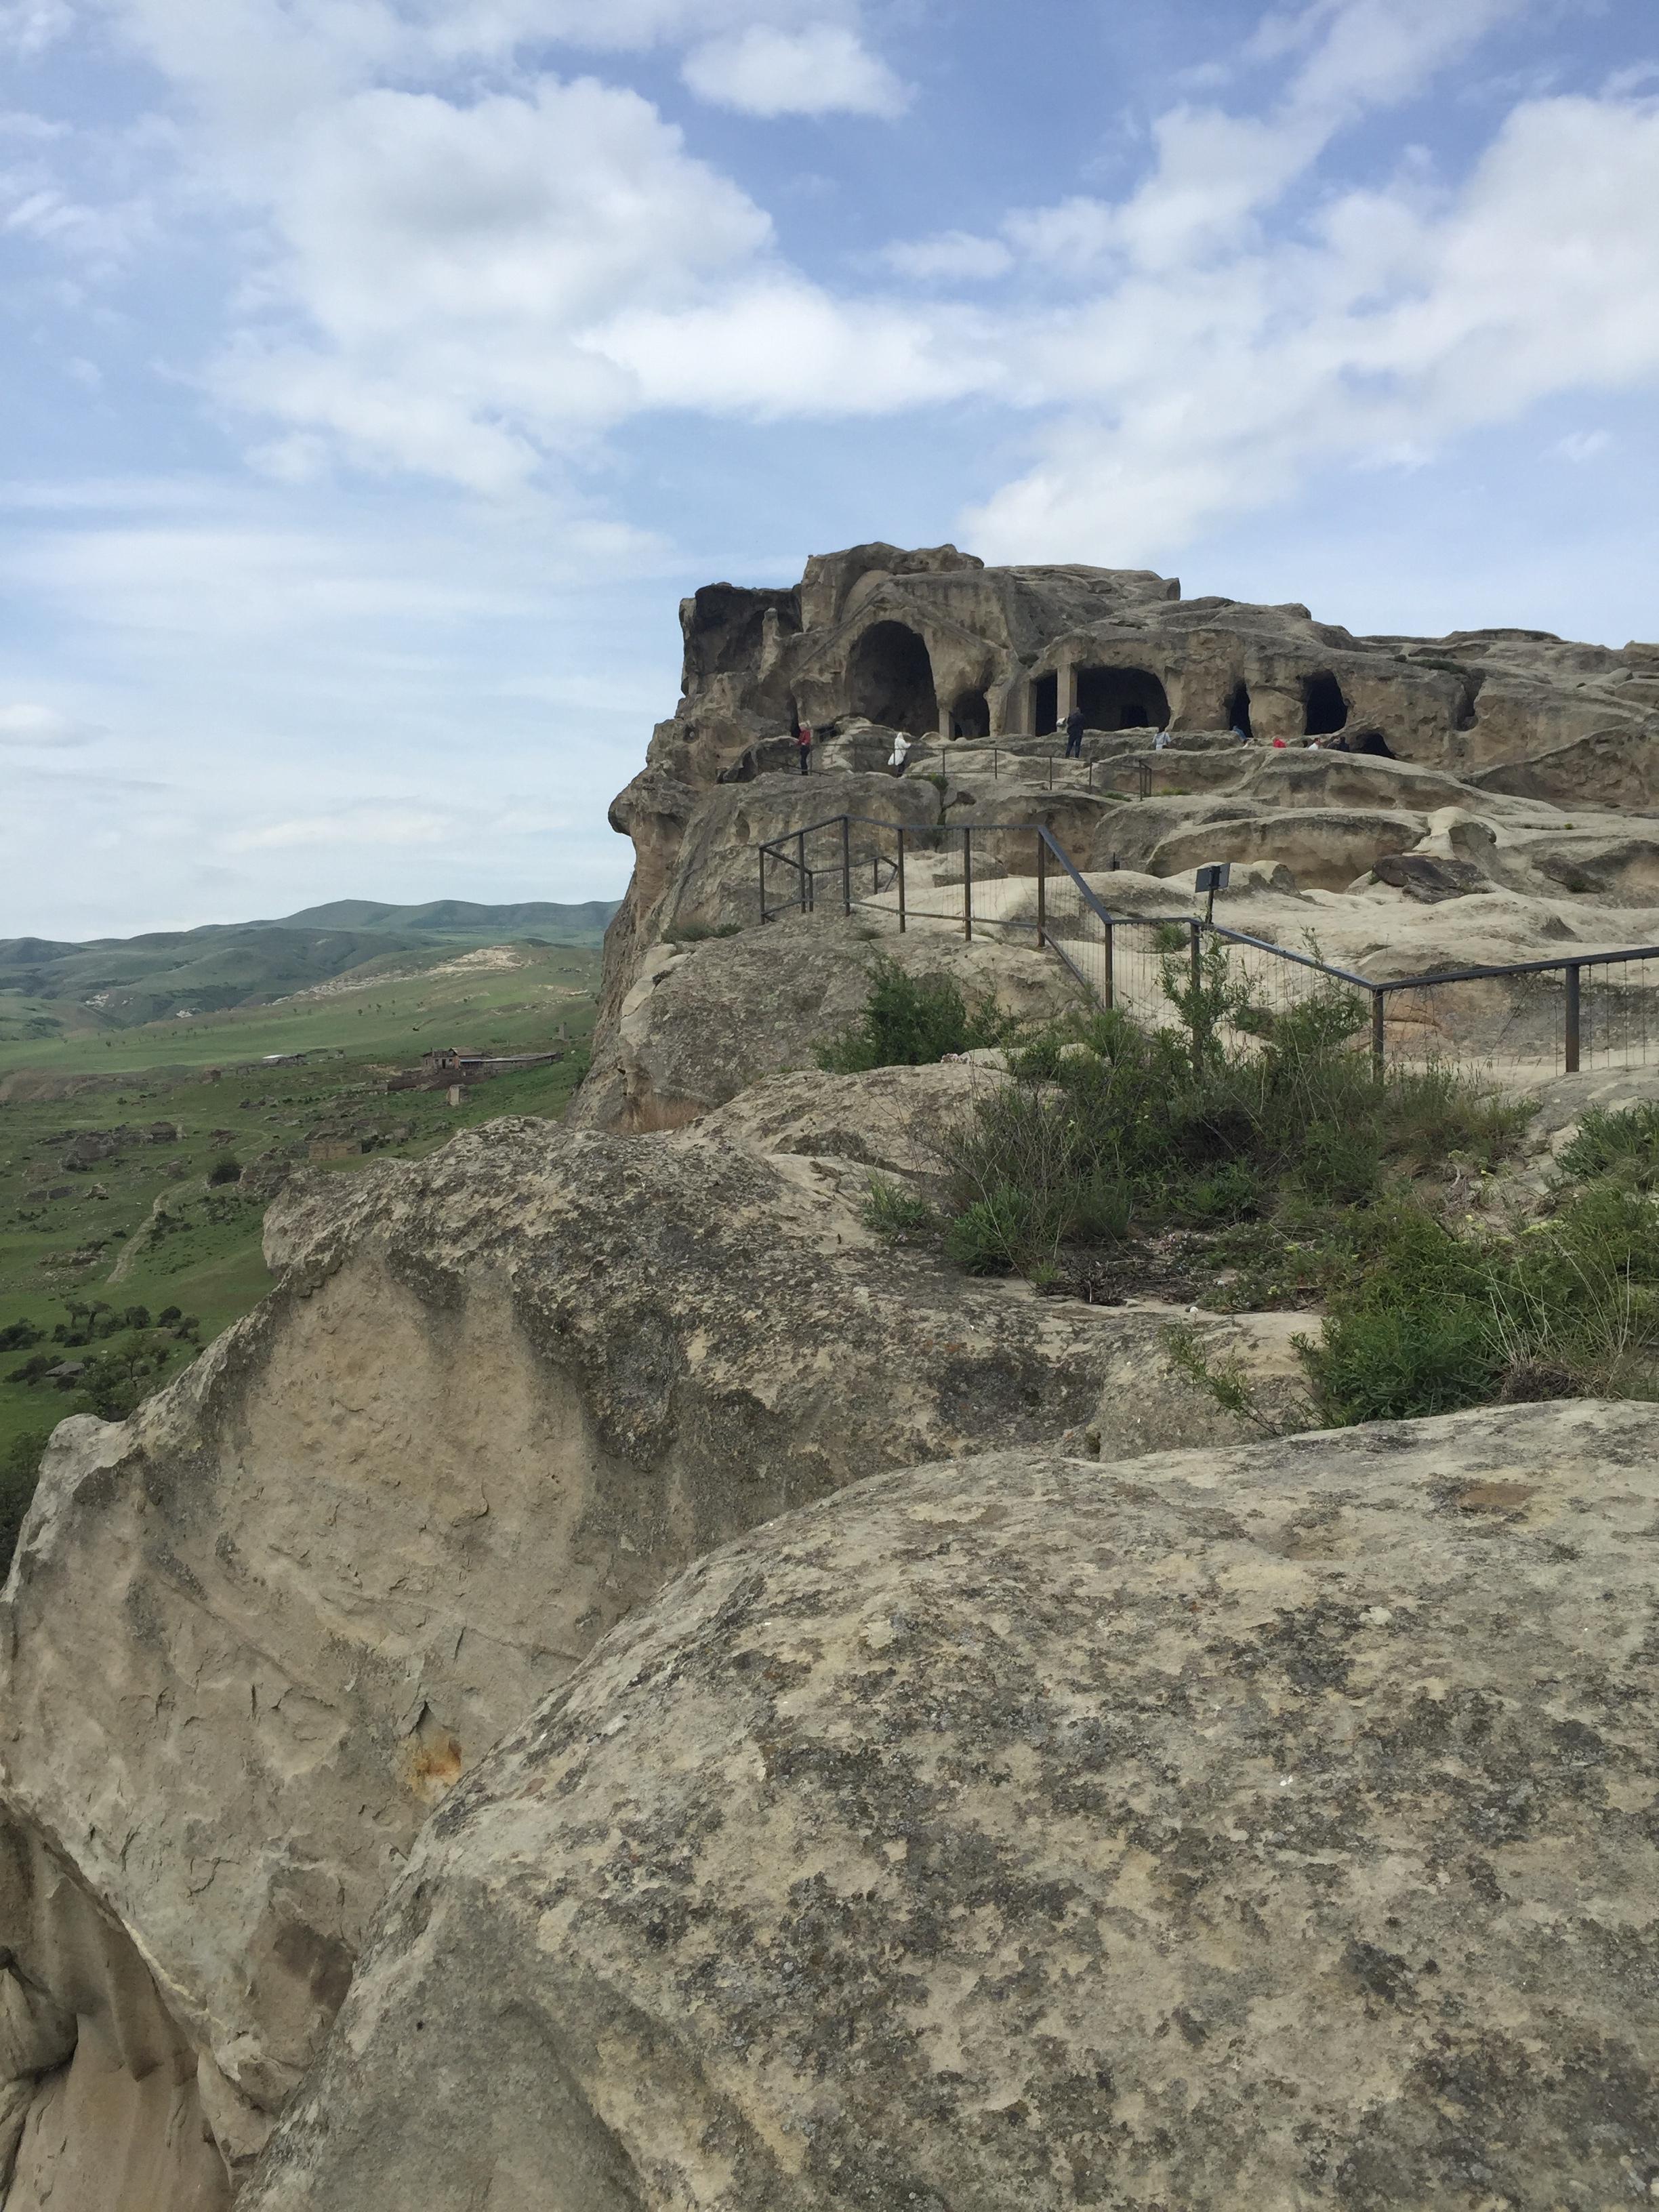 The ancient Uplistsikhe cave city